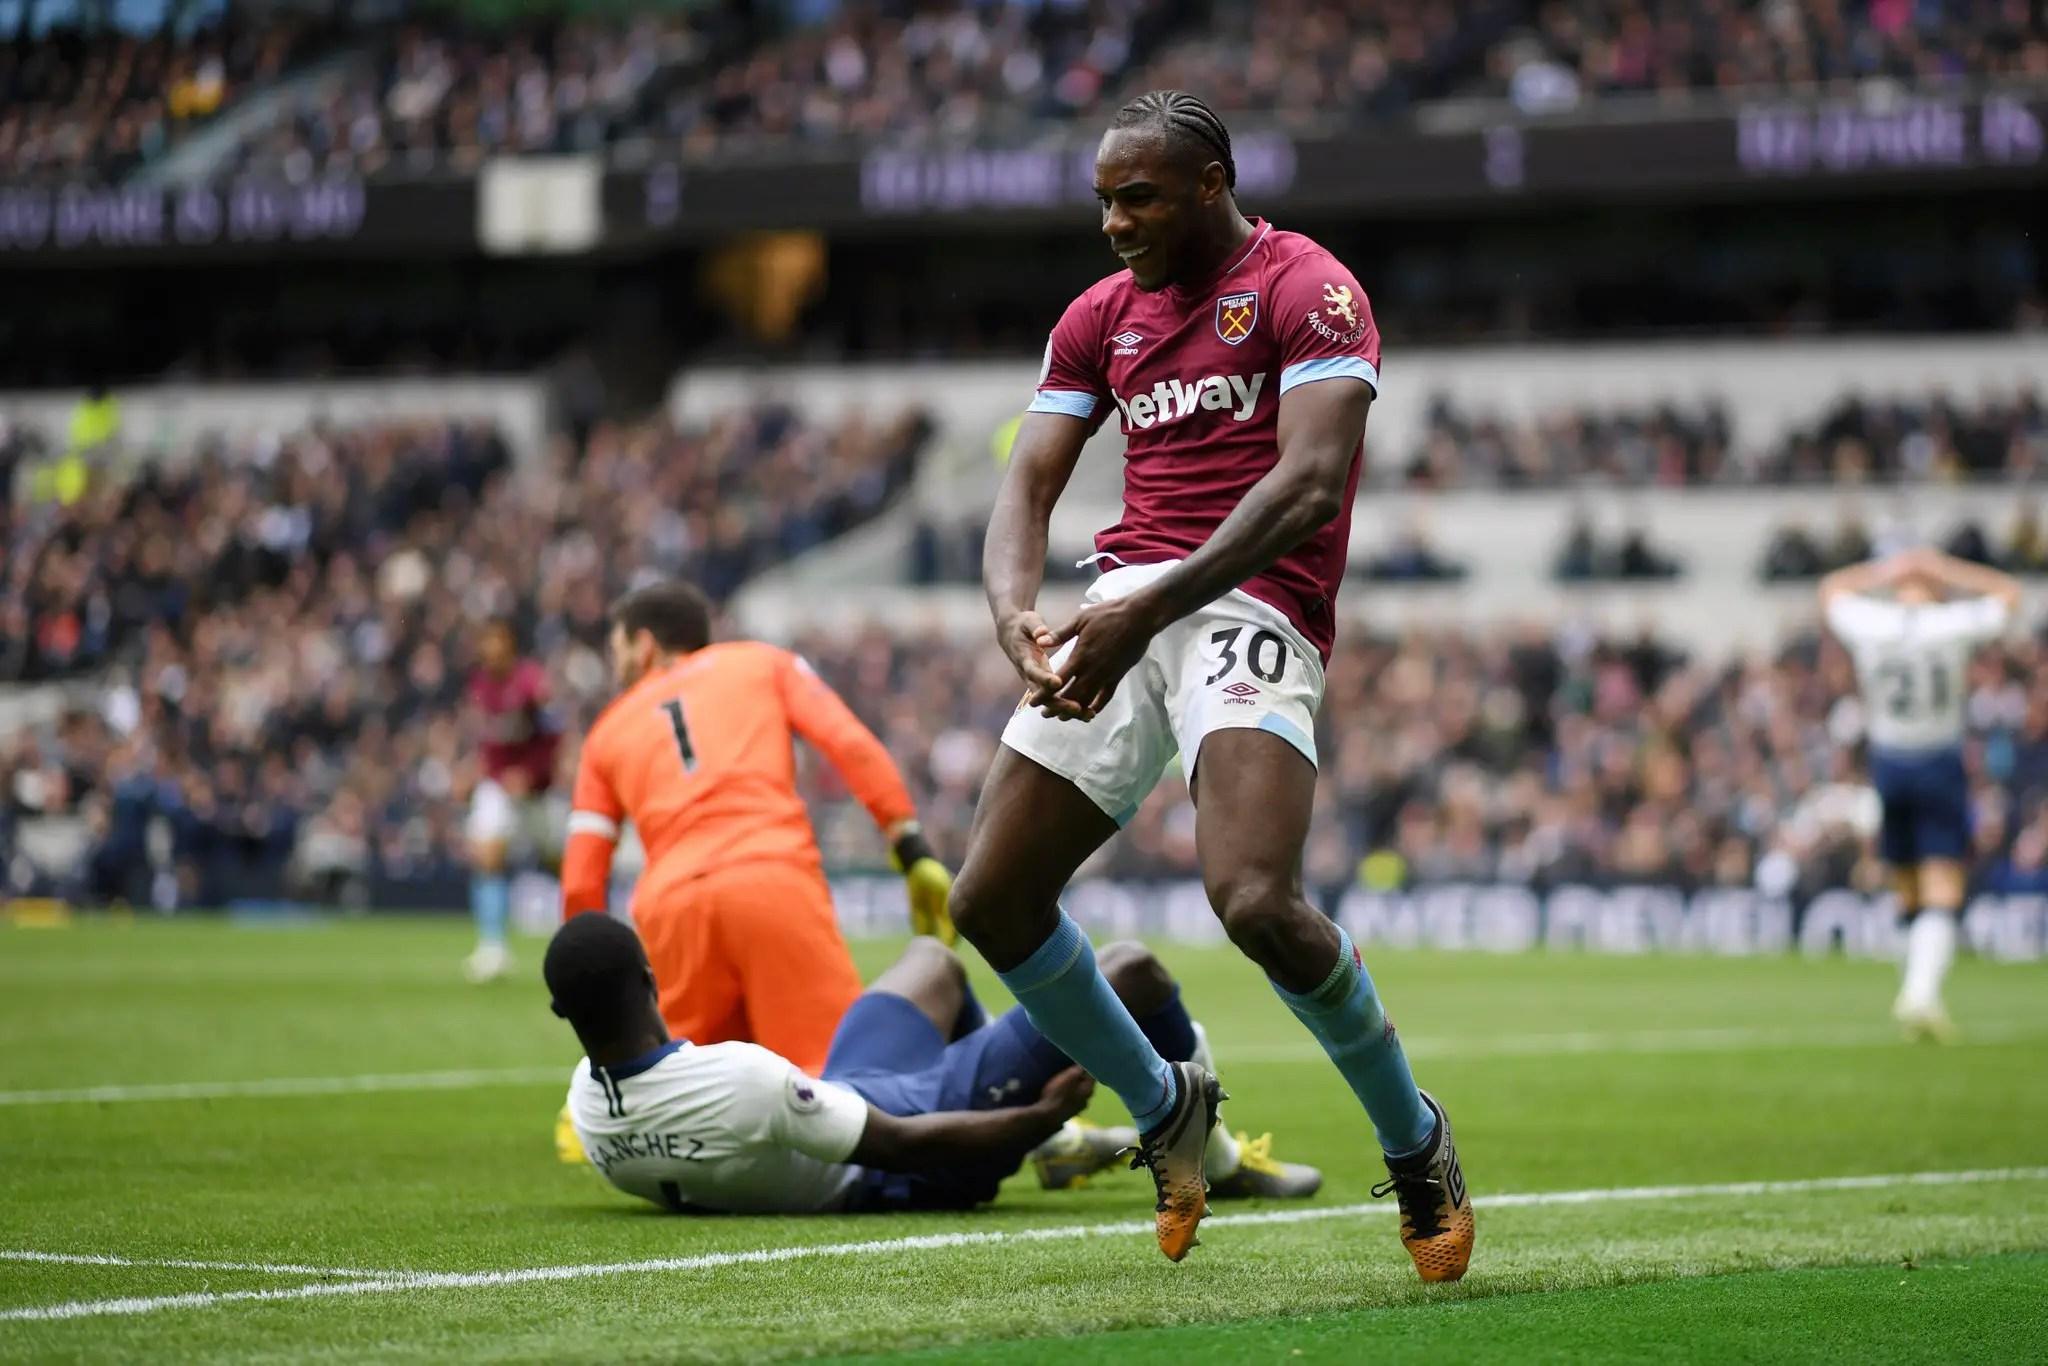 West Ham Win At Tottenham Stadium To Dent Spurs' UCL Hopes